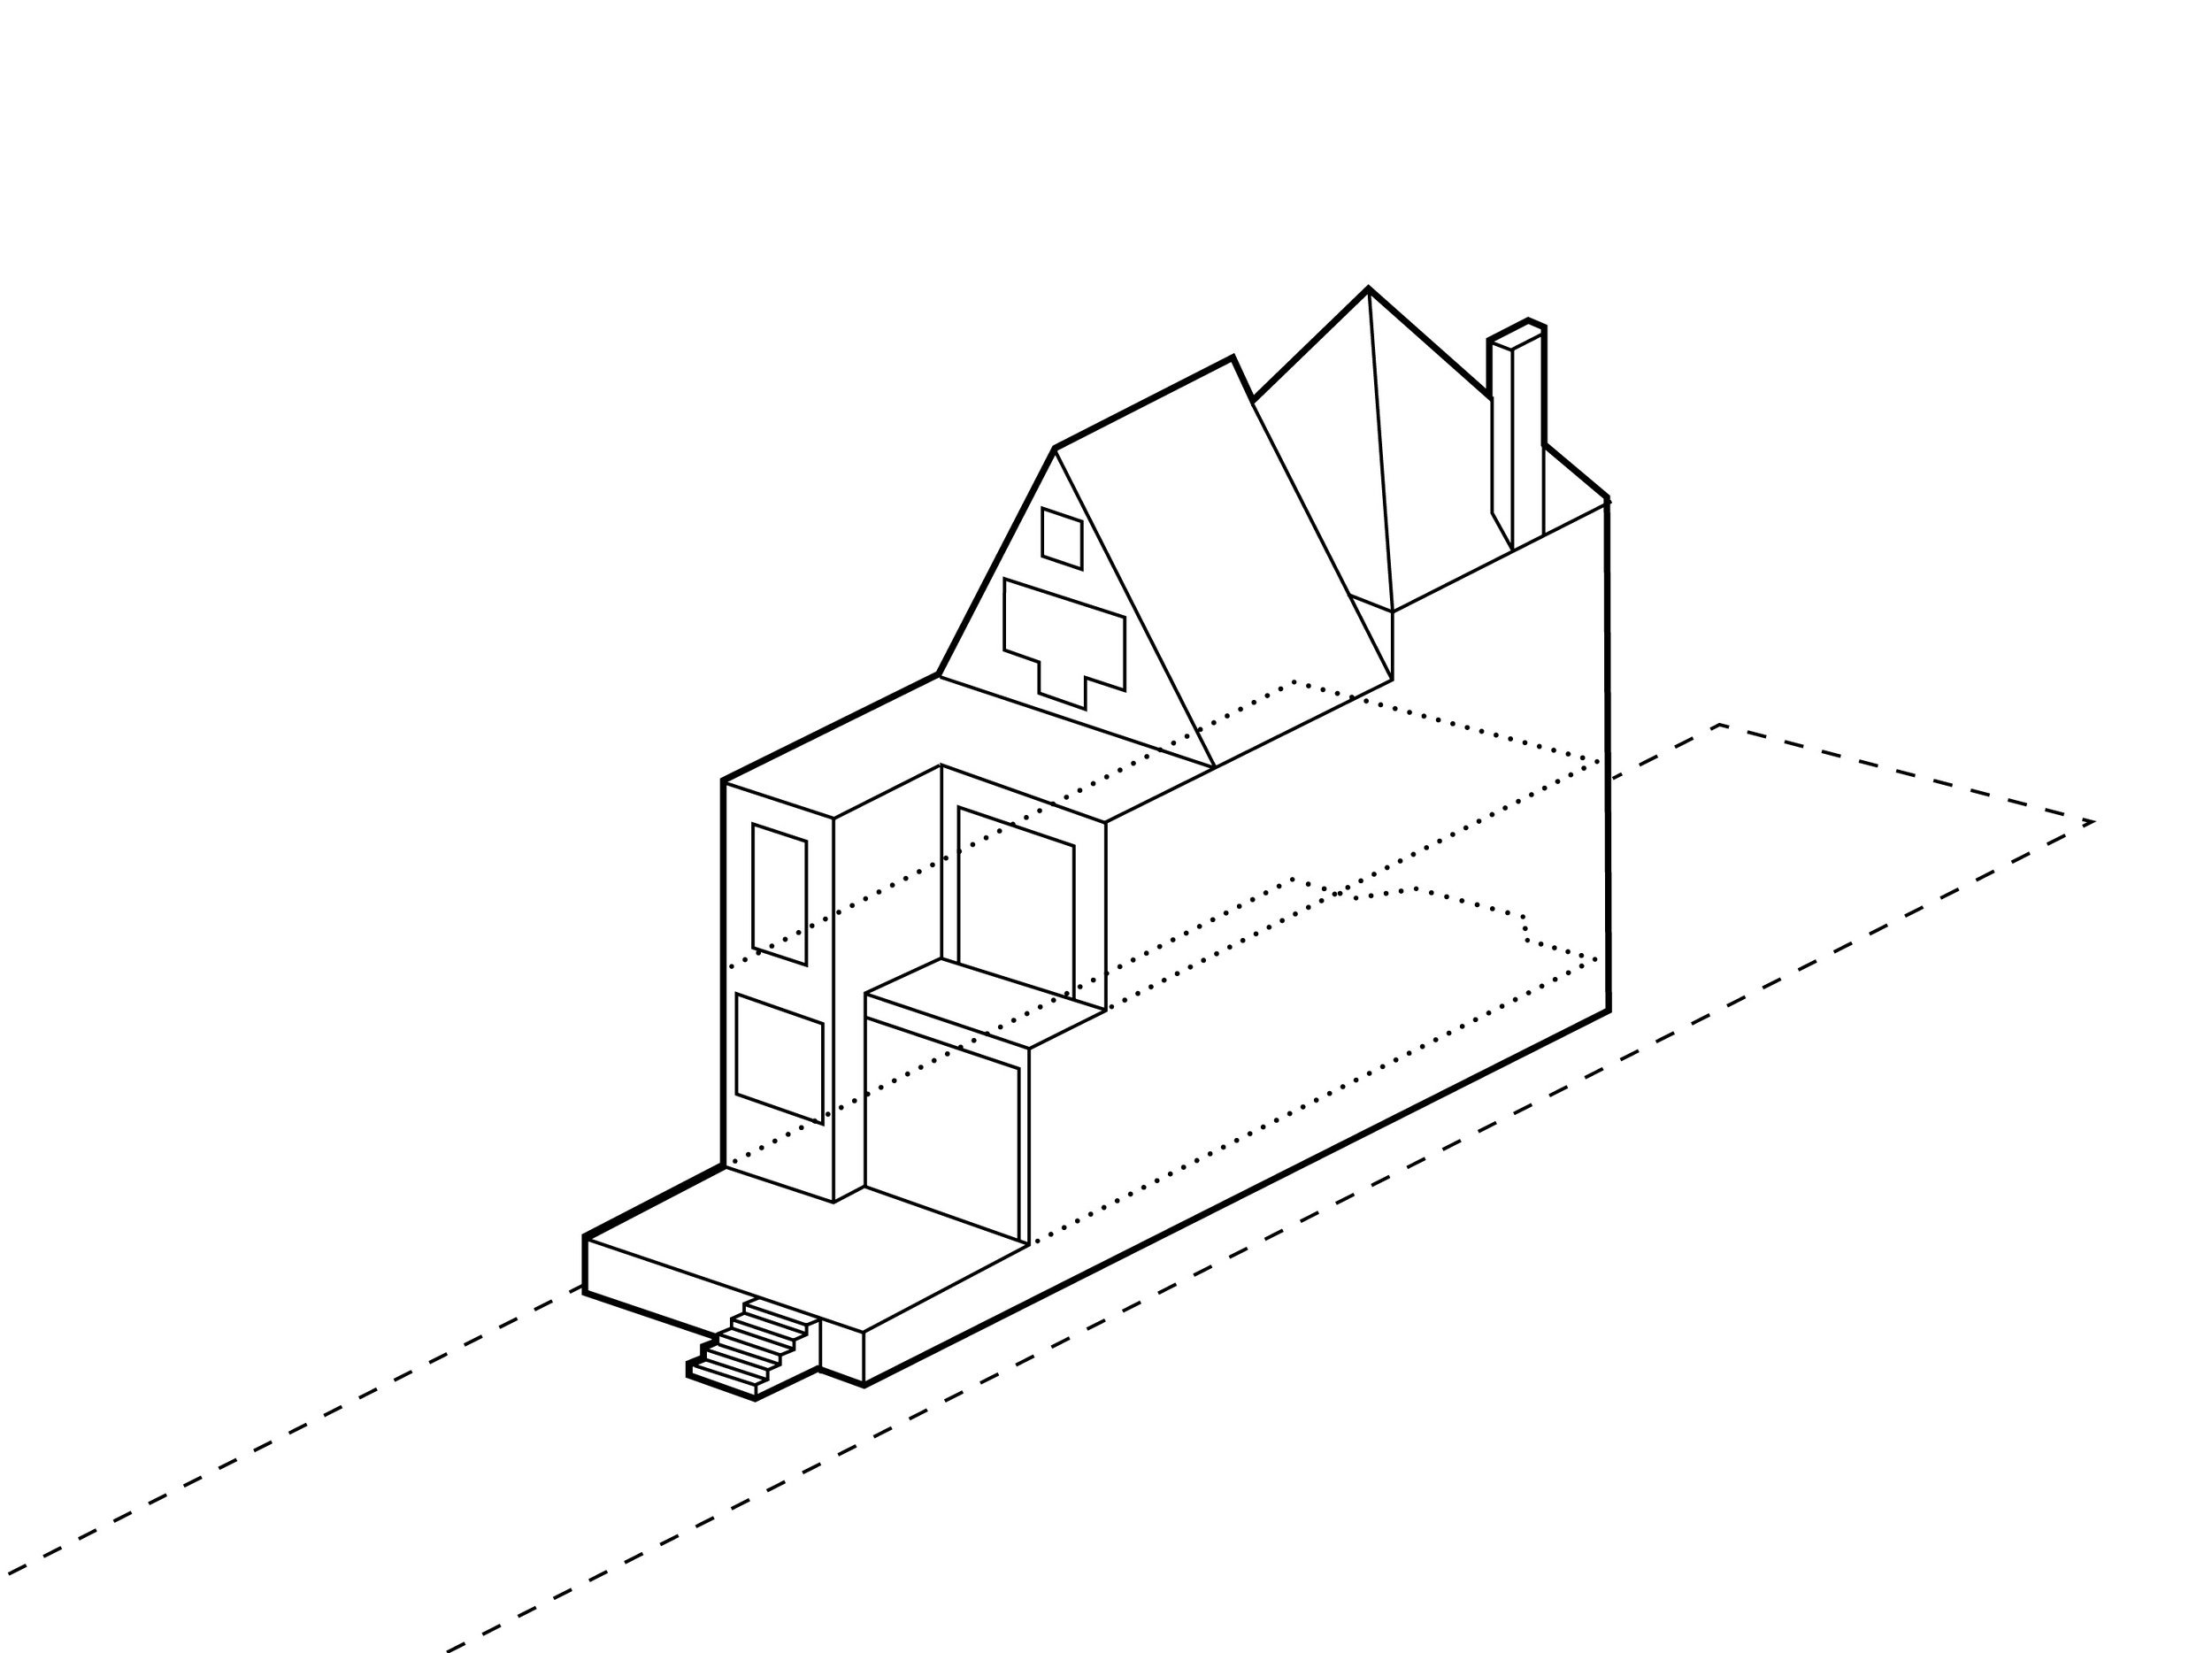 Personal-Architecture-rotterdam-woonhuis7-1.jpg